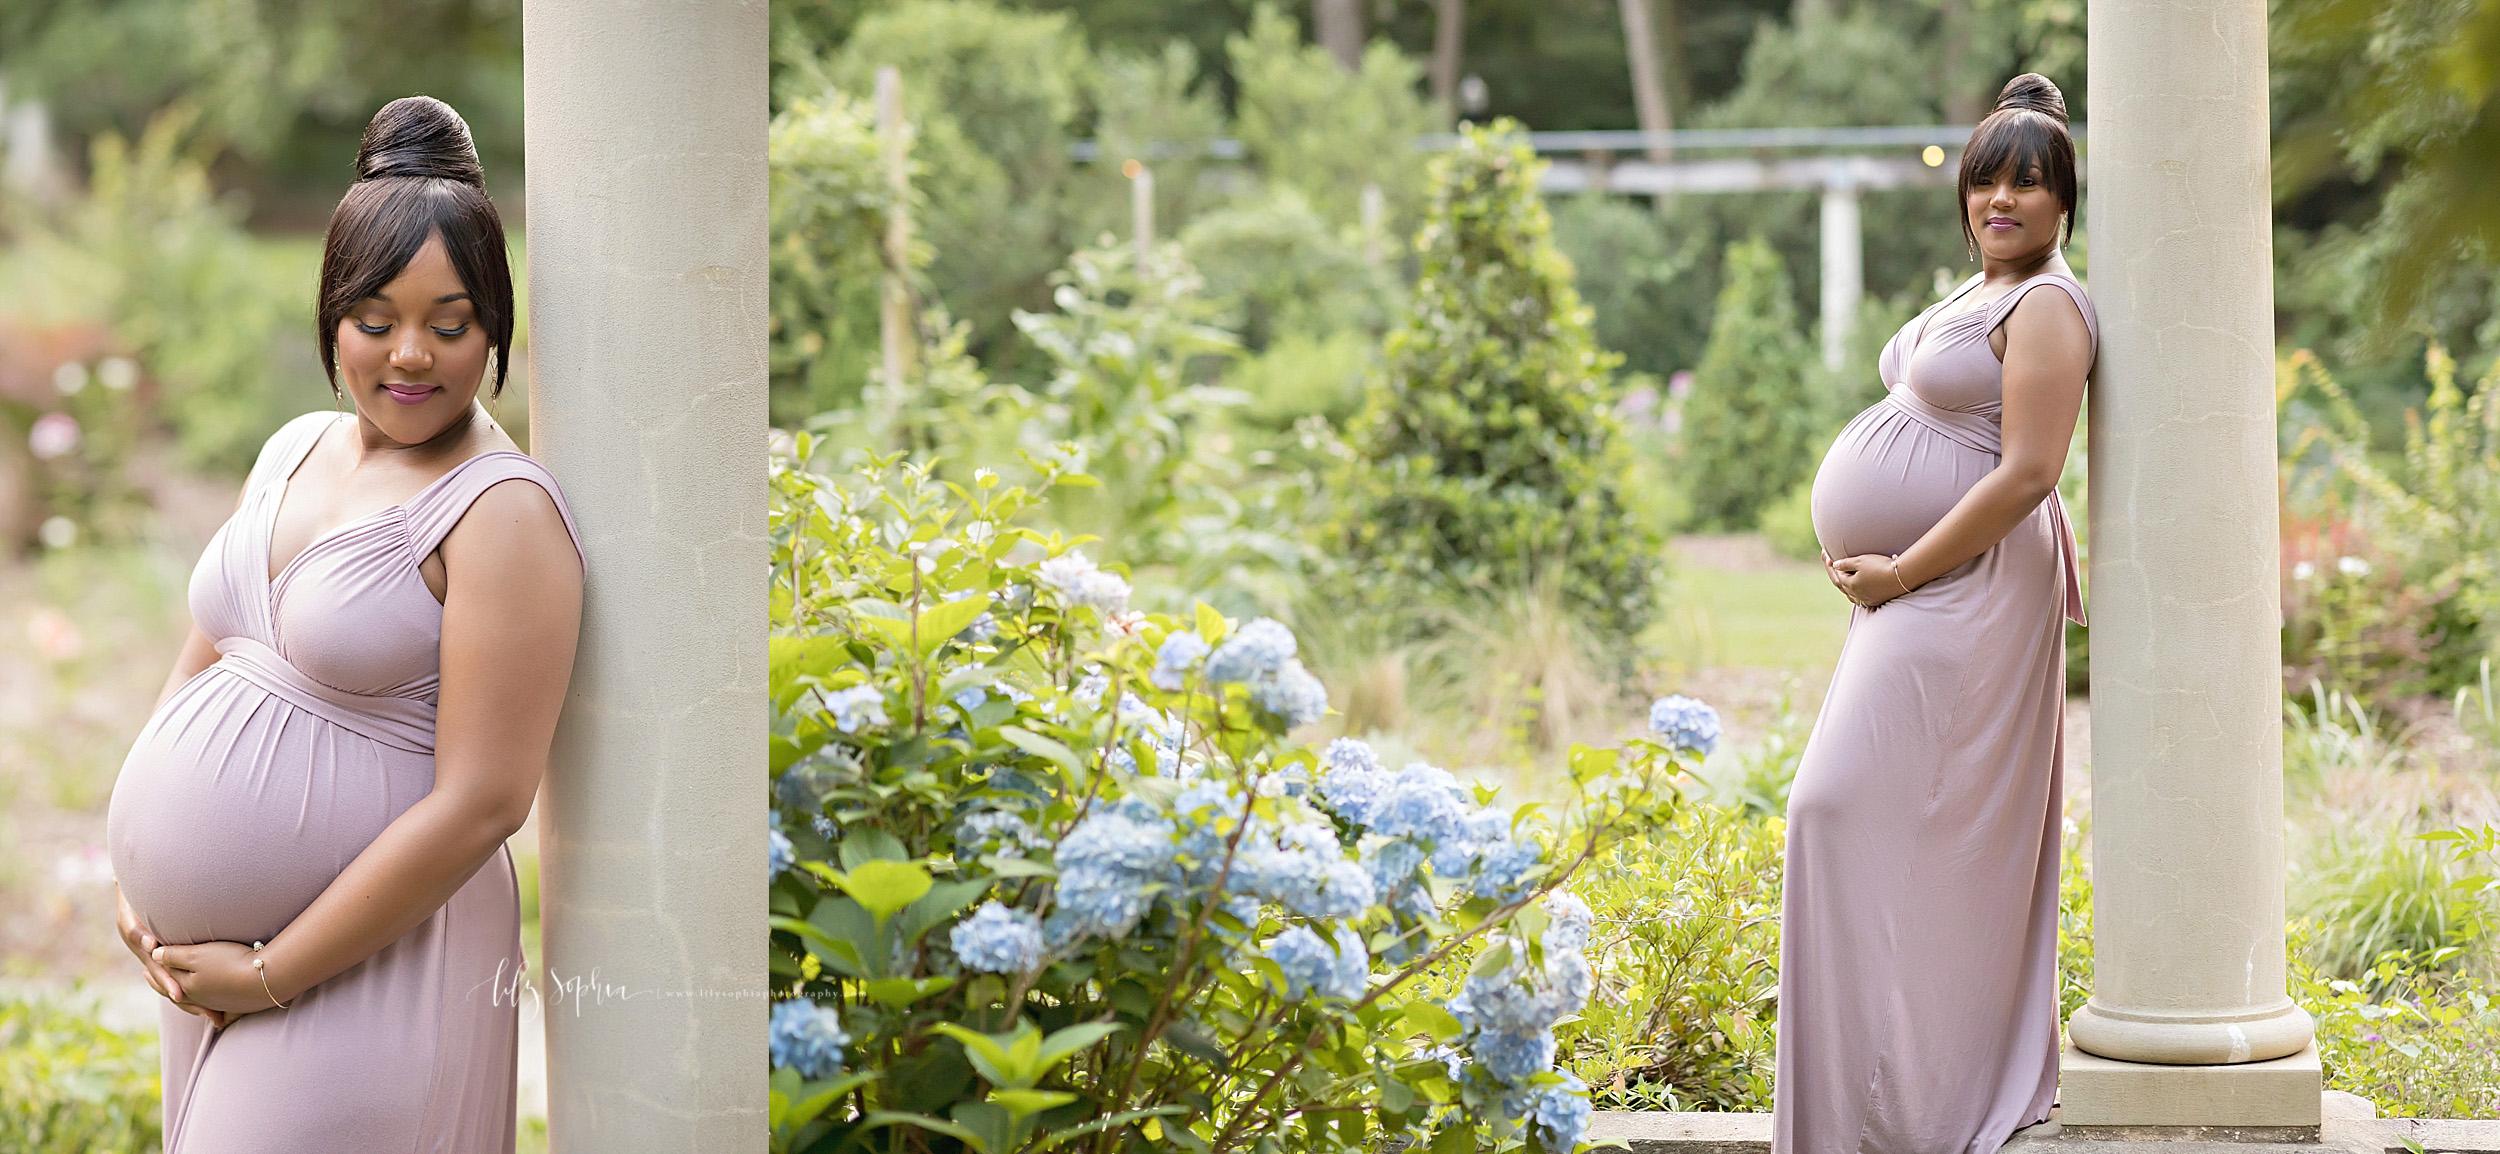 atlanta-buckhead-acworth-brookhaven-lily-sophia-photography-baby-maternity-photographer-maternity-portraits-outdoor-gardens-sunset-grant-park-intown-pregnant-expecting-baby-boy_0223.jpg